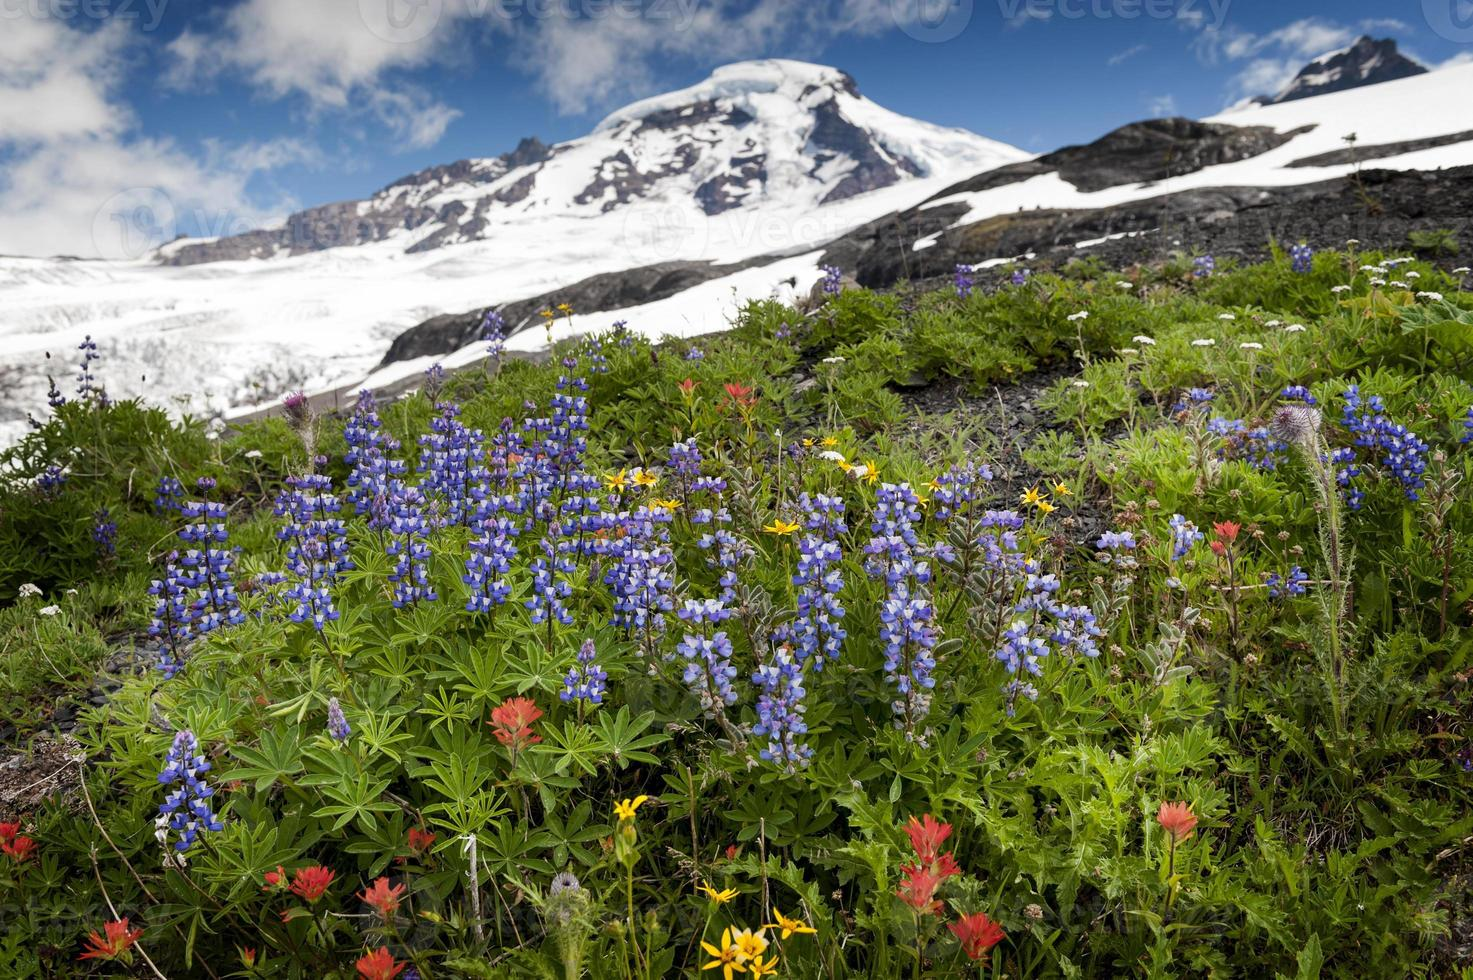 Mt. Baker Wildflowers photo